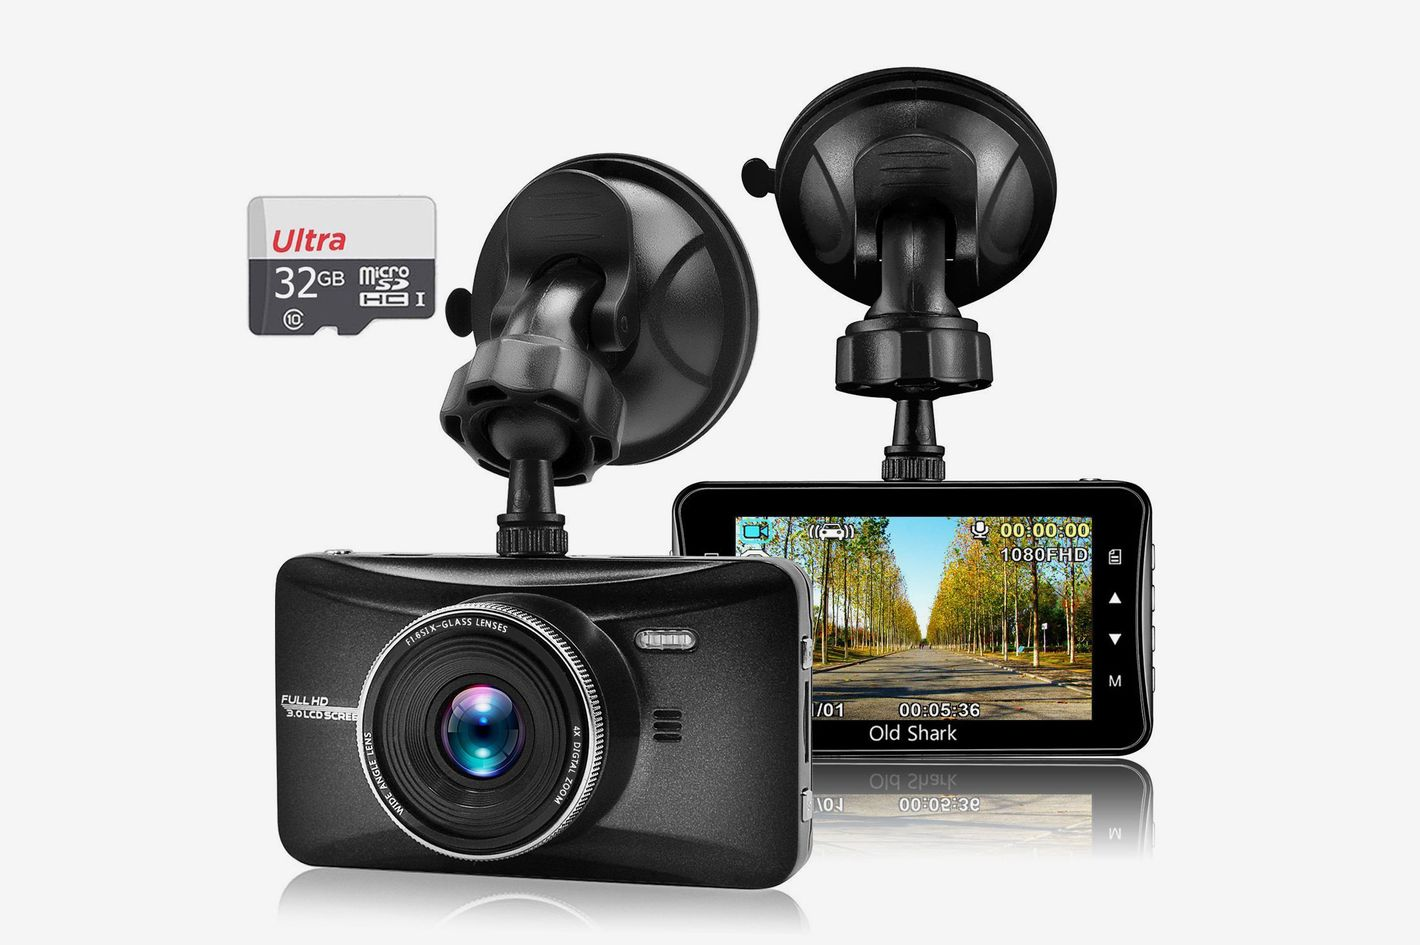 oldshark car video camera dash cam